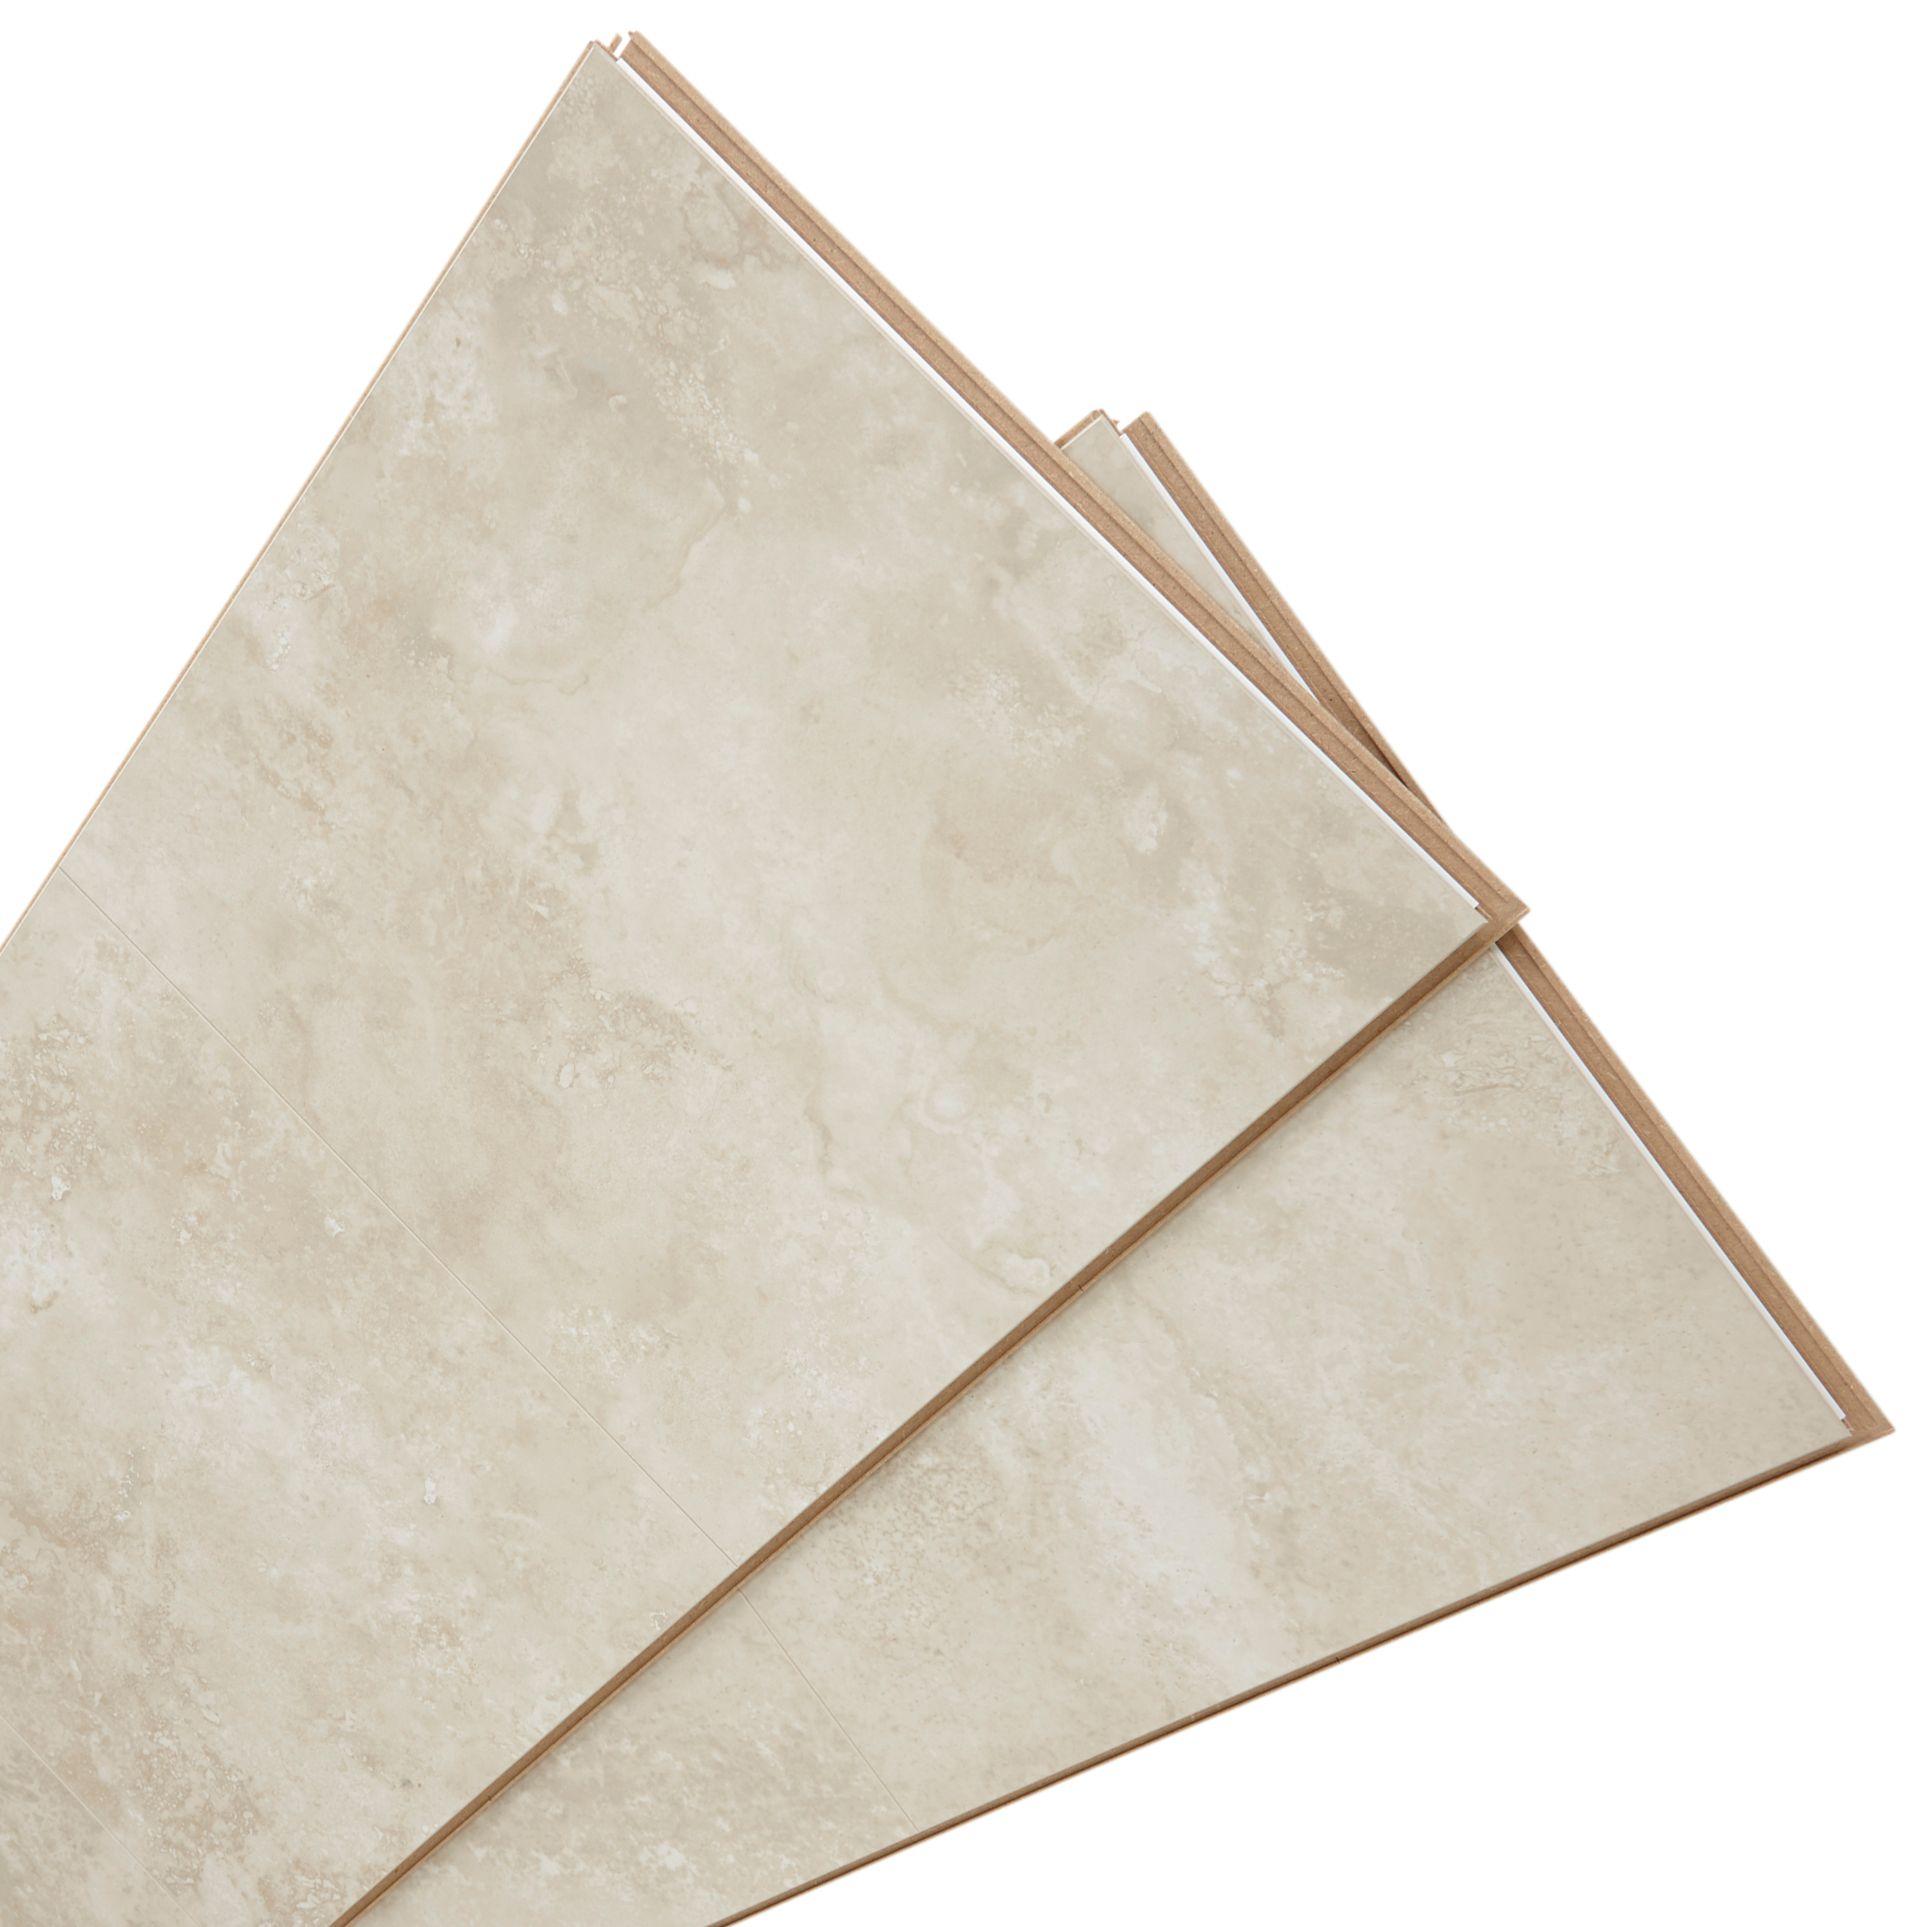 Quickstep tila cream travertine tile effect laminate flooring 1 m quickstep tila cream travertine tile effect laminate flooring 1 m pack dailygadgetfo Gallery